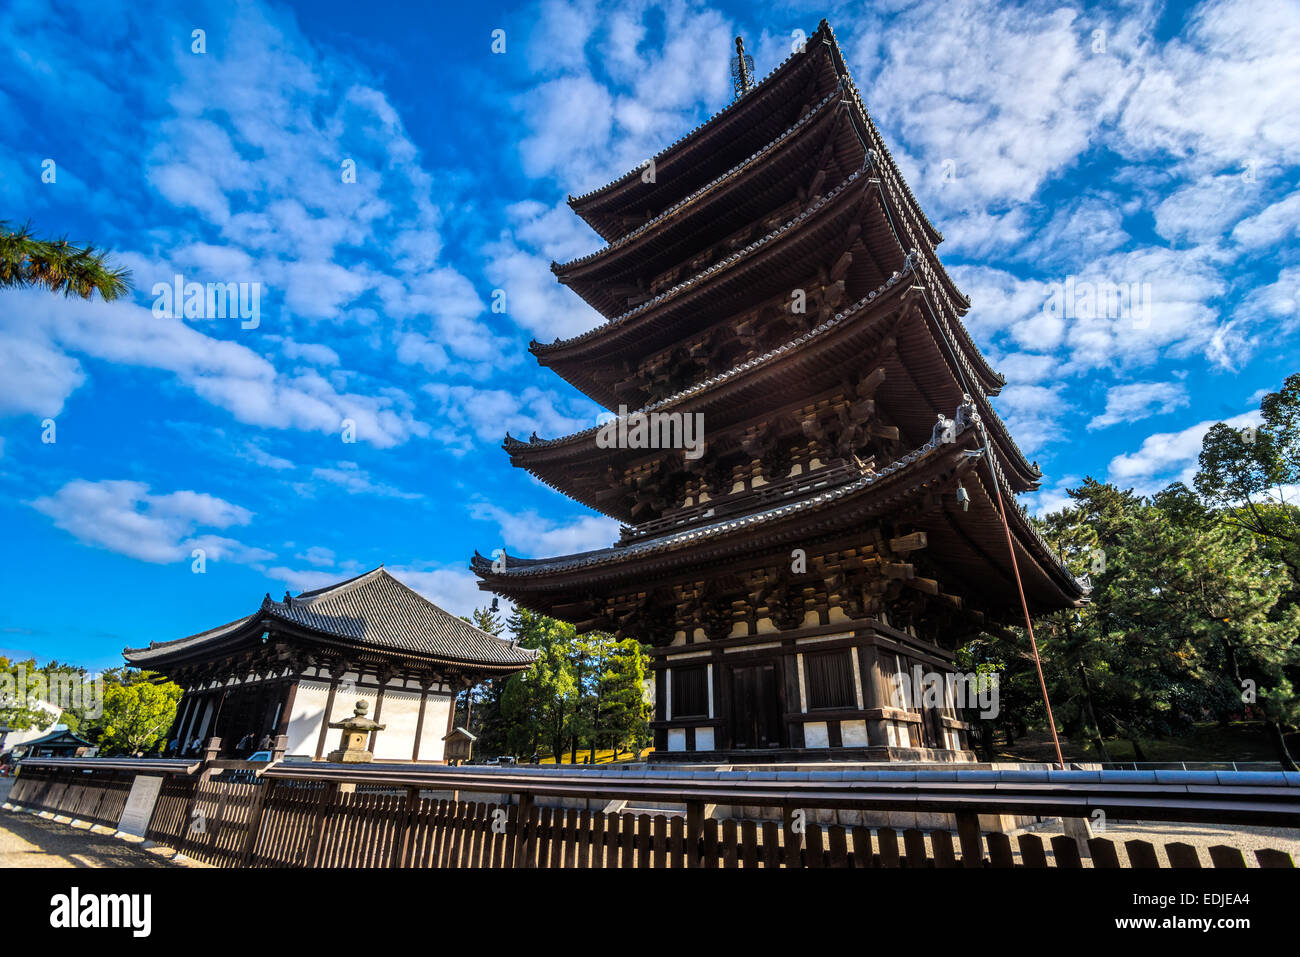 Kofuku-ji wooden tower in Nara, Japan. One of the eight Unesco world heritage sites in Nara. - Stock Image